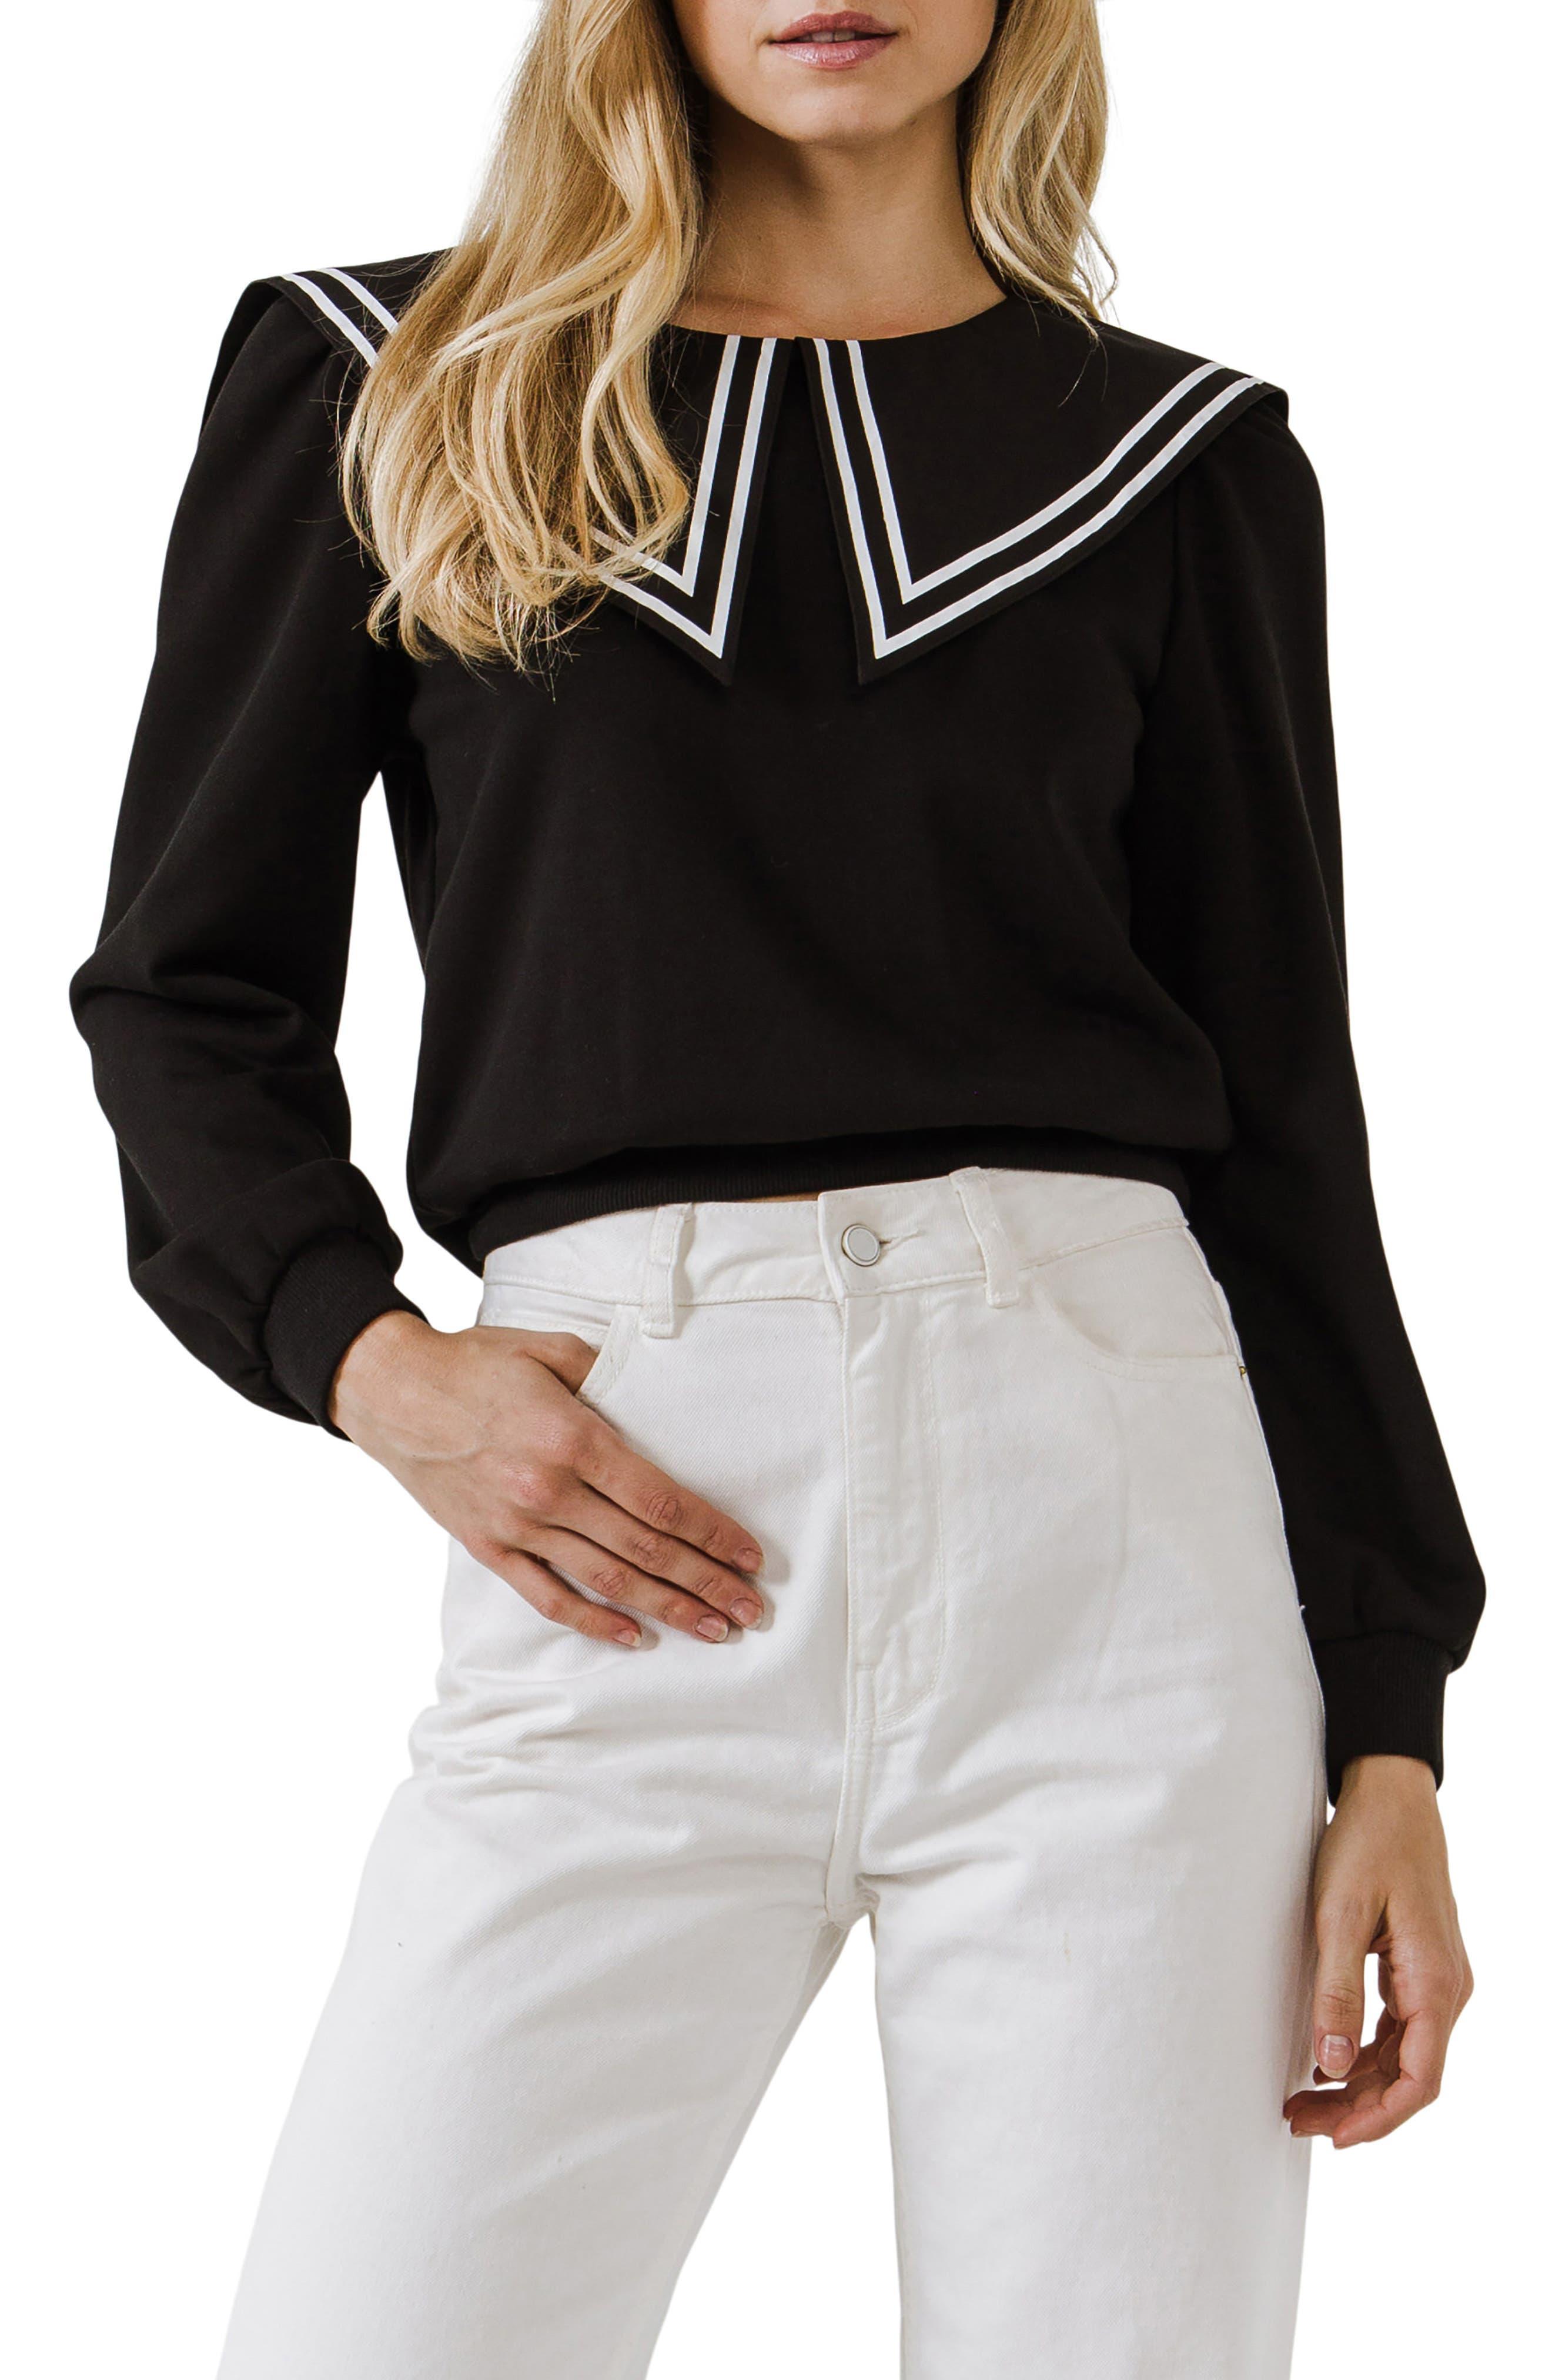 Edwardian Blouses |  Lace Blouses, Sweaters, Vests Womens English Factory Sailor Collar Cotton Sweatshirt Size Small - Black $80.00 AT vintagedancer.com